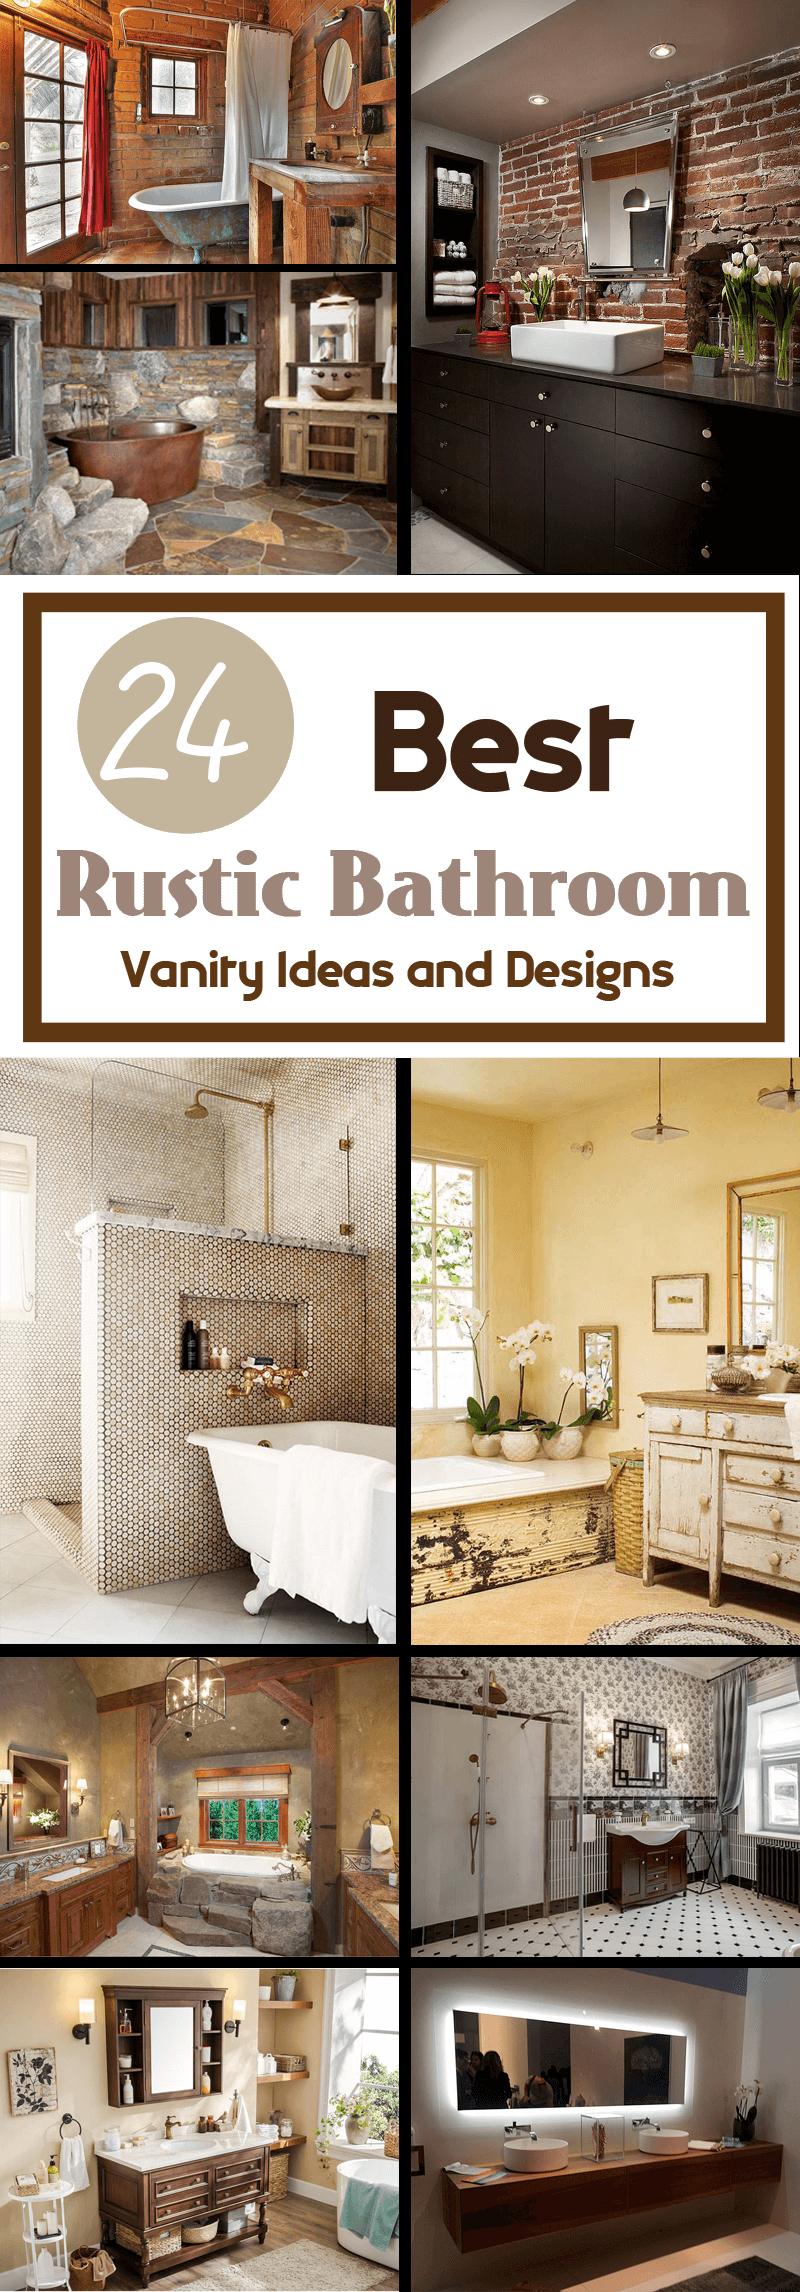 best rusticbathroomvanity ideas and designs